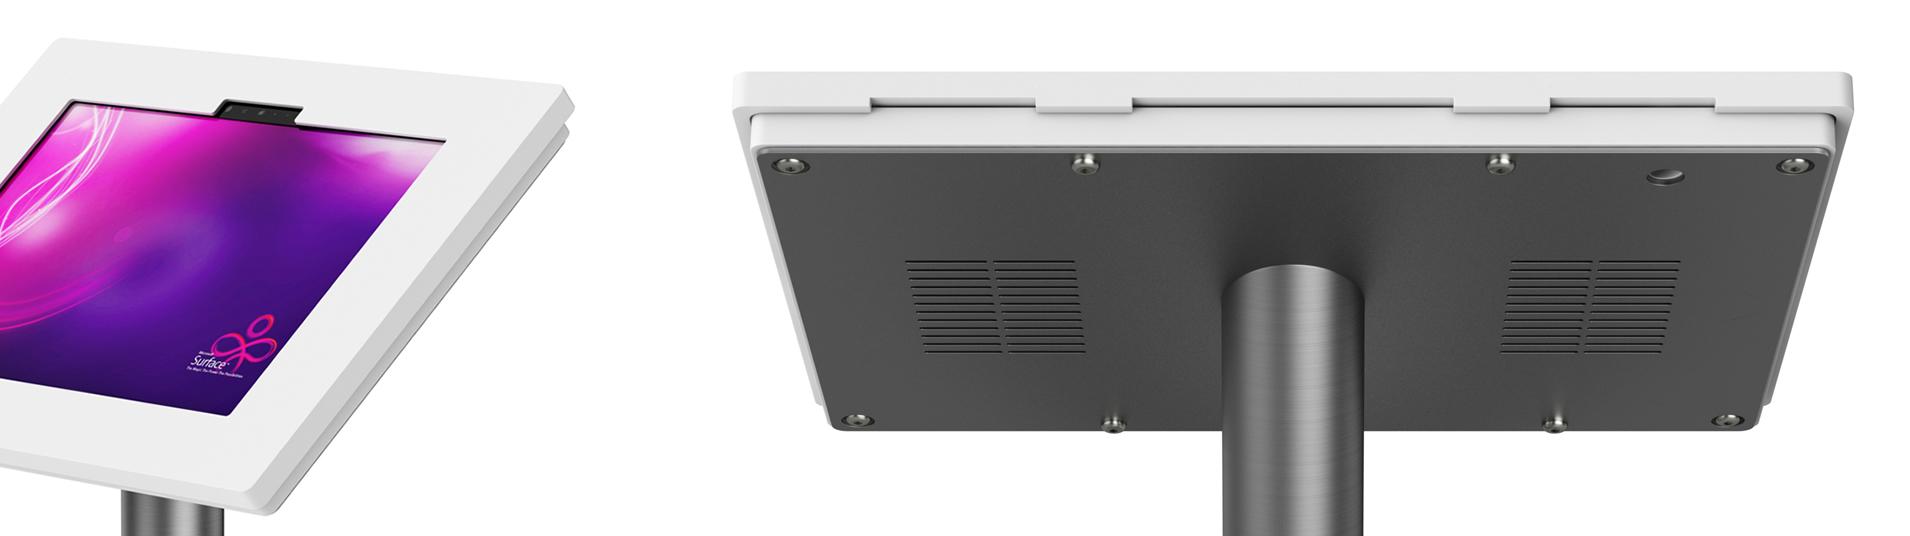 tussenstuk-ipad-stand-villa-proctrl-presentatie-materiaal